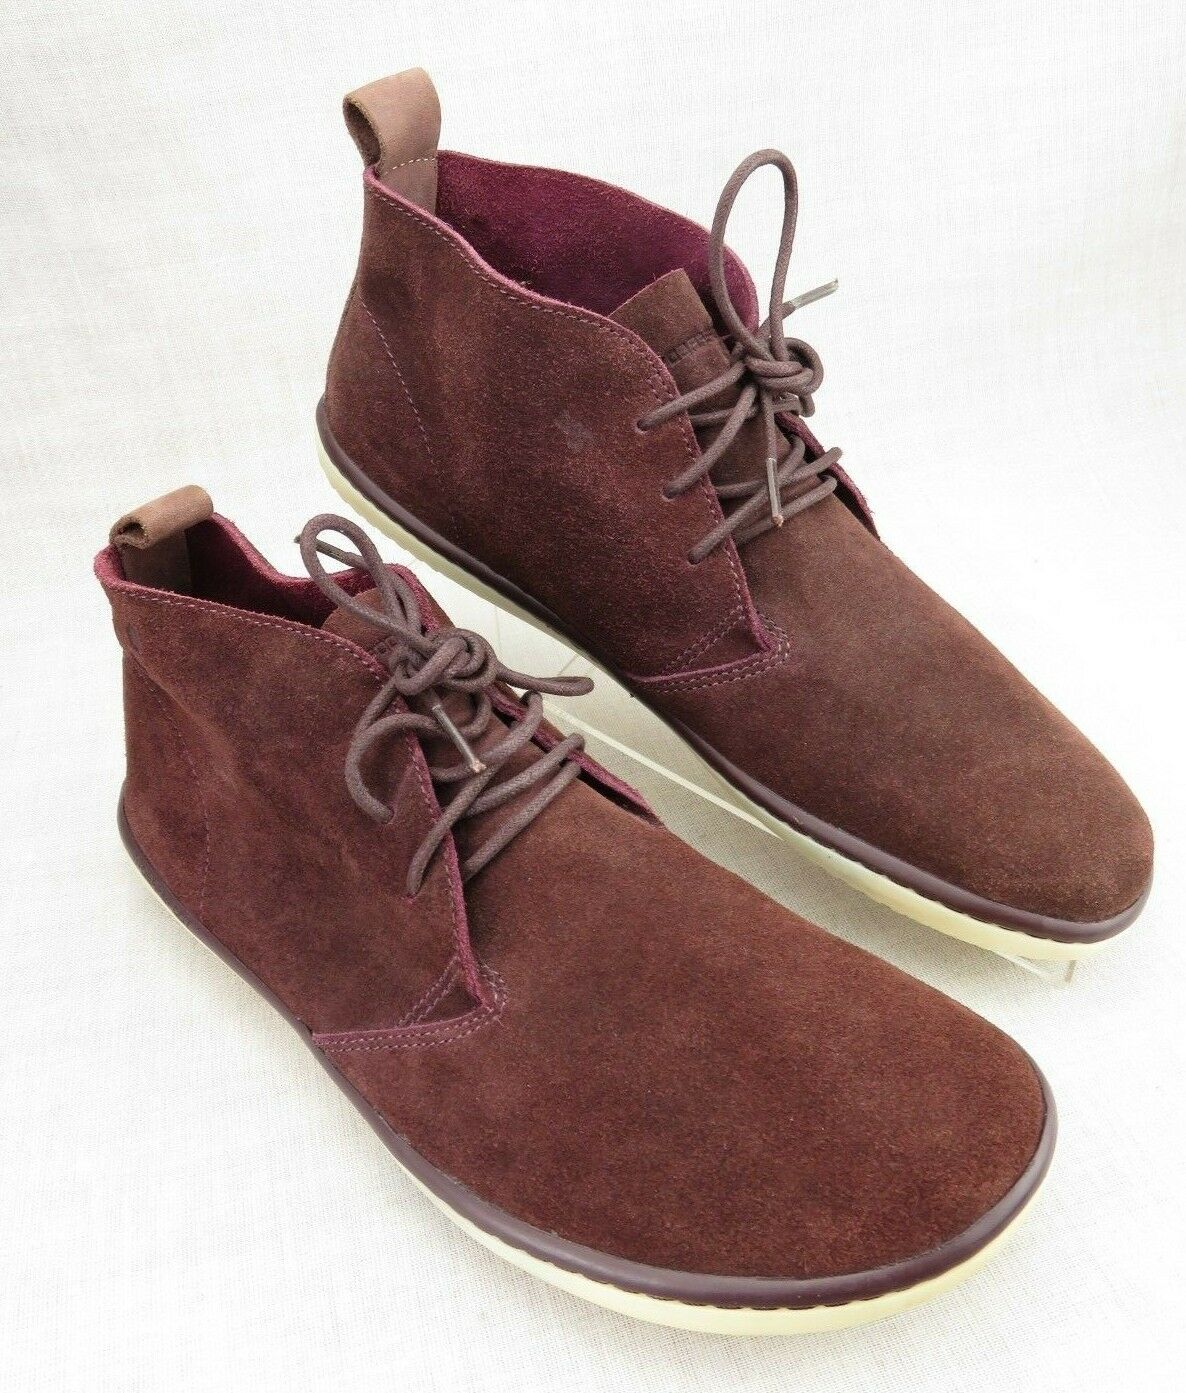 vendita all'ingrosso Vivobarefoot Gobi II M Rare Burgundy Suede Chukka Chukka Chukka Minimalist scarpe 42 Uomo US 9  vendita outlet